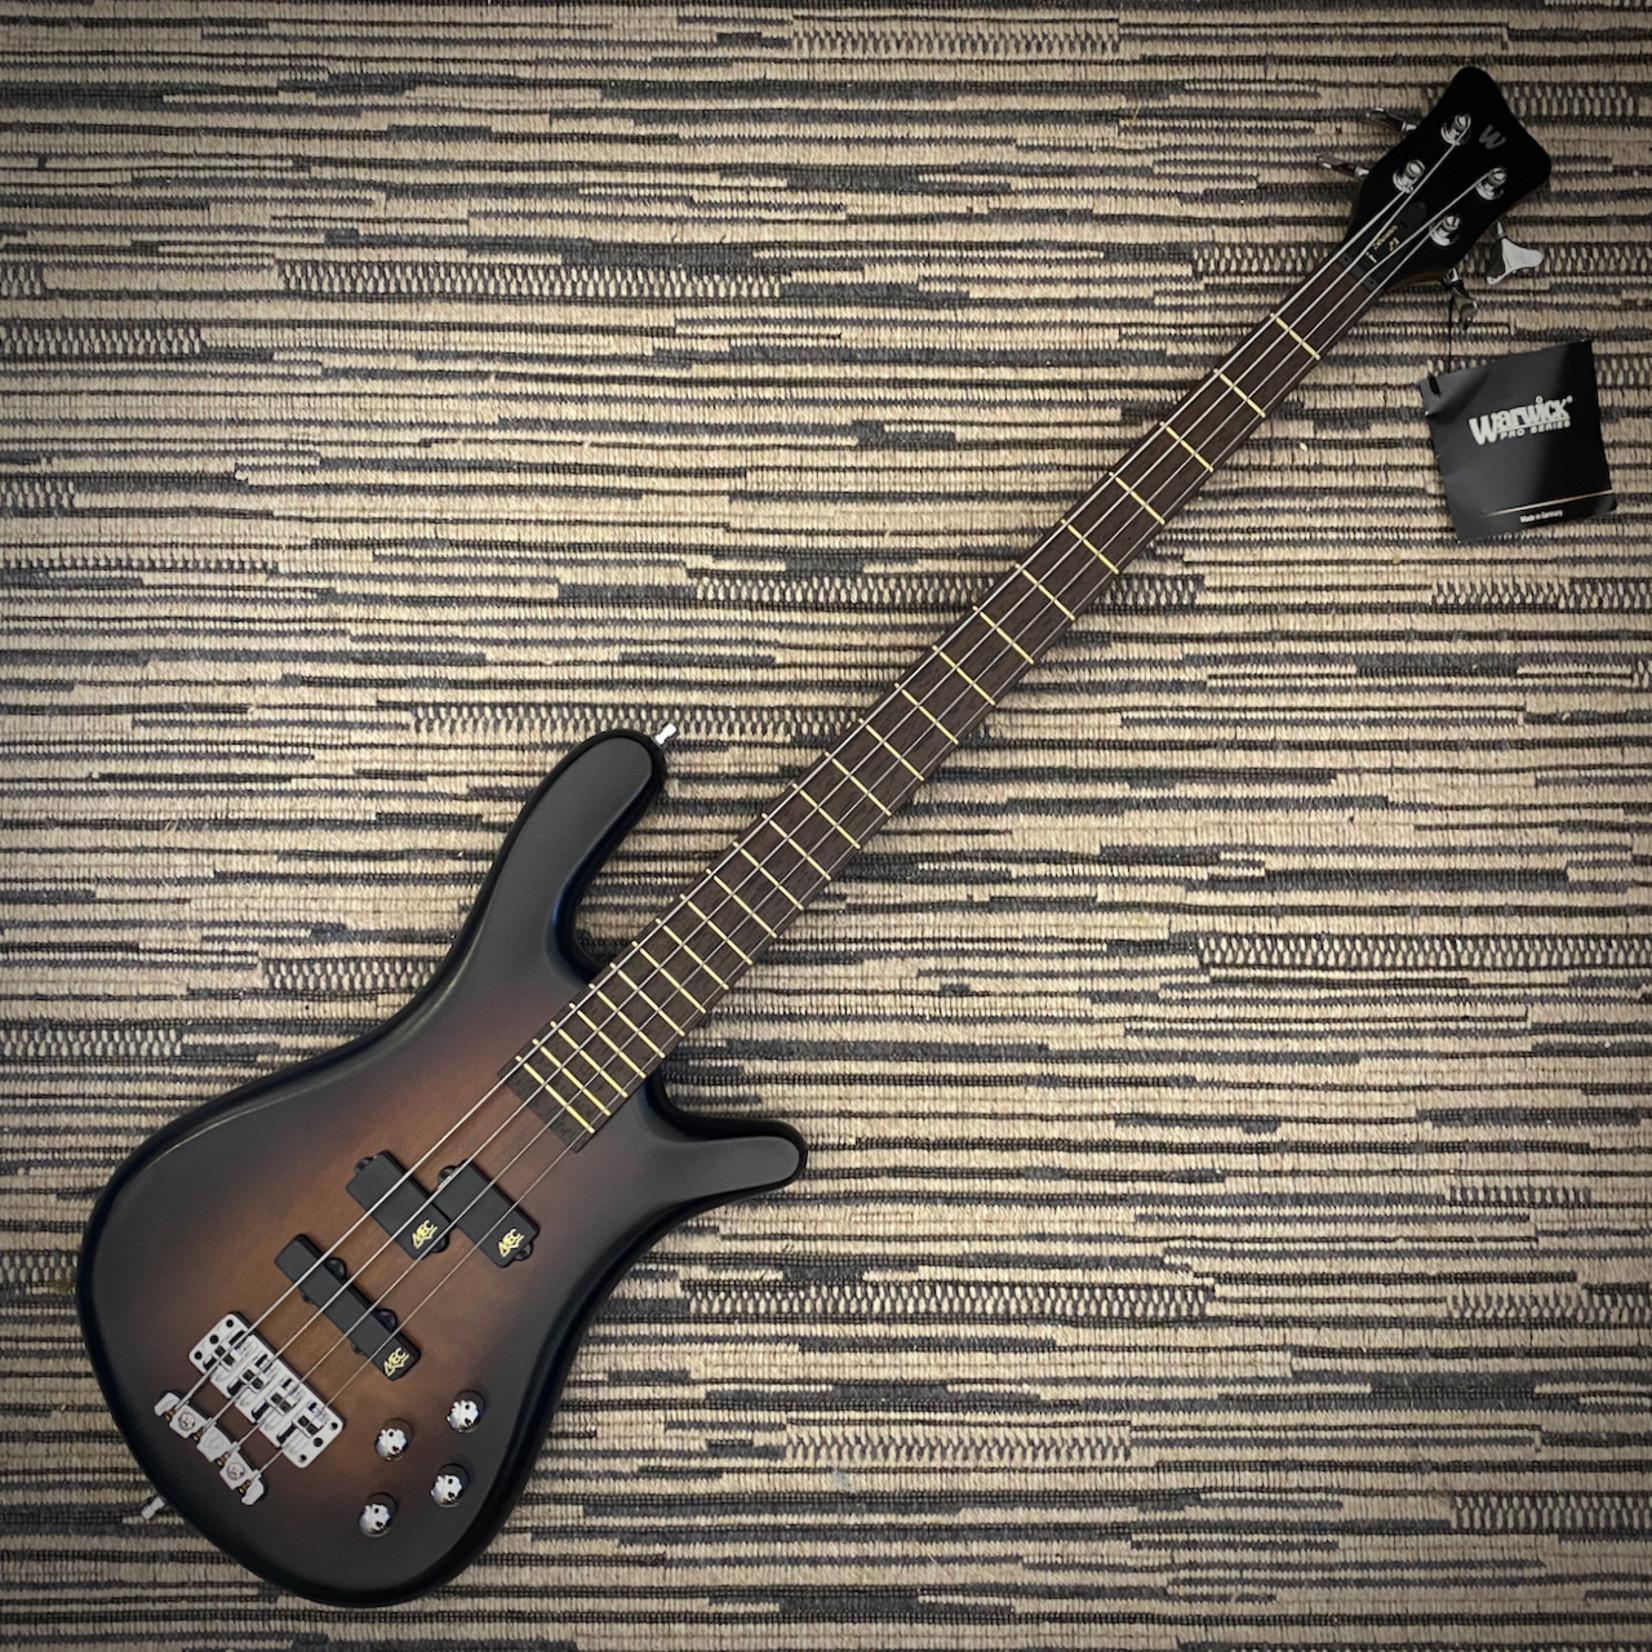 Warwick Warwick Teambuilt Pro Series Streamer LX, 4-String Bass, Active - Vintage Sunburst Trans Satin (2021)